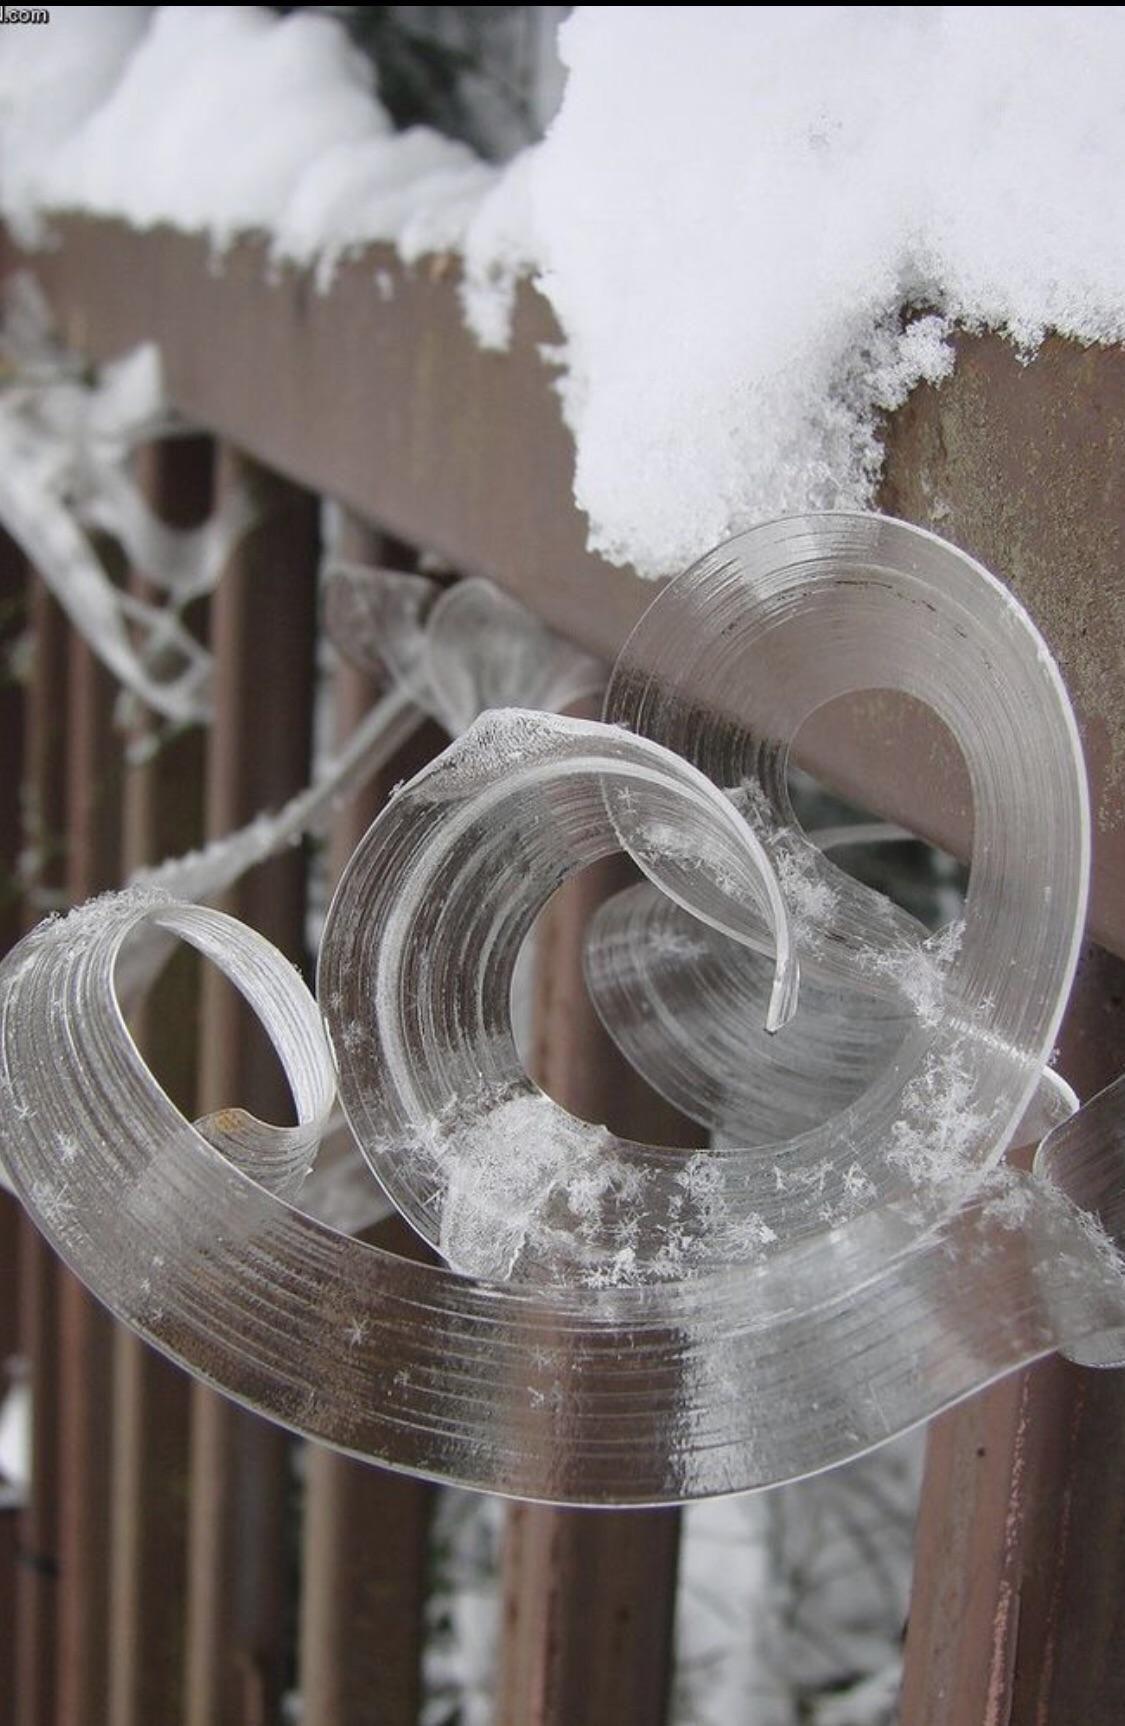 This satisfying ice development